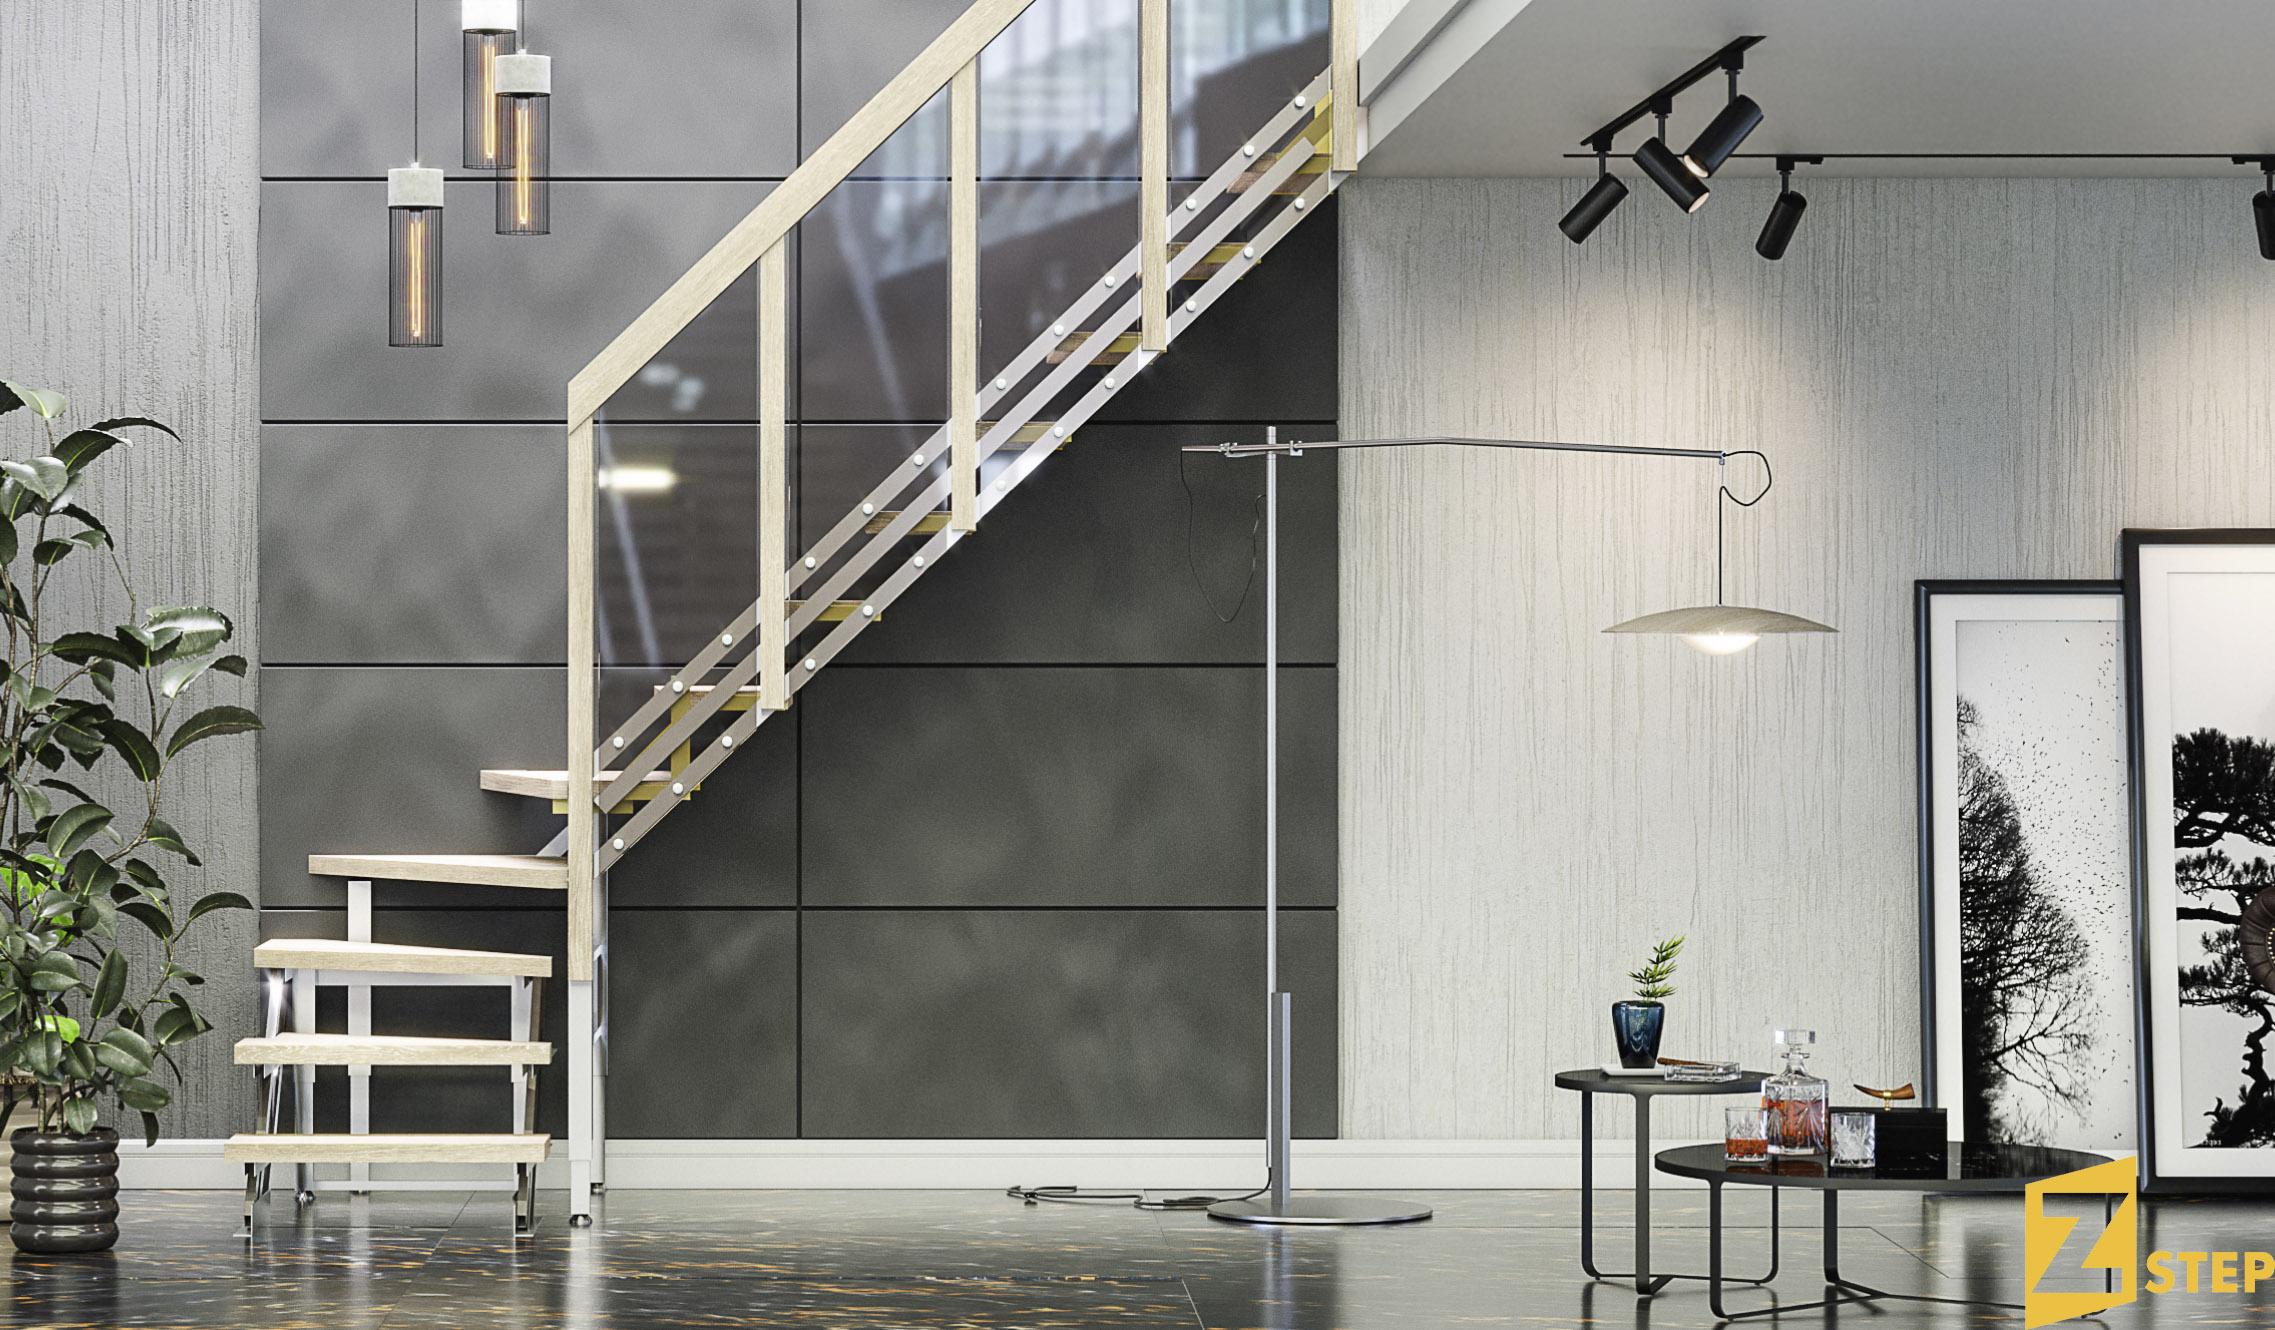 лестницы_Zstep_stairs_LOFT_Lestnitsy_stairs_metal_g-obraznaya_glass